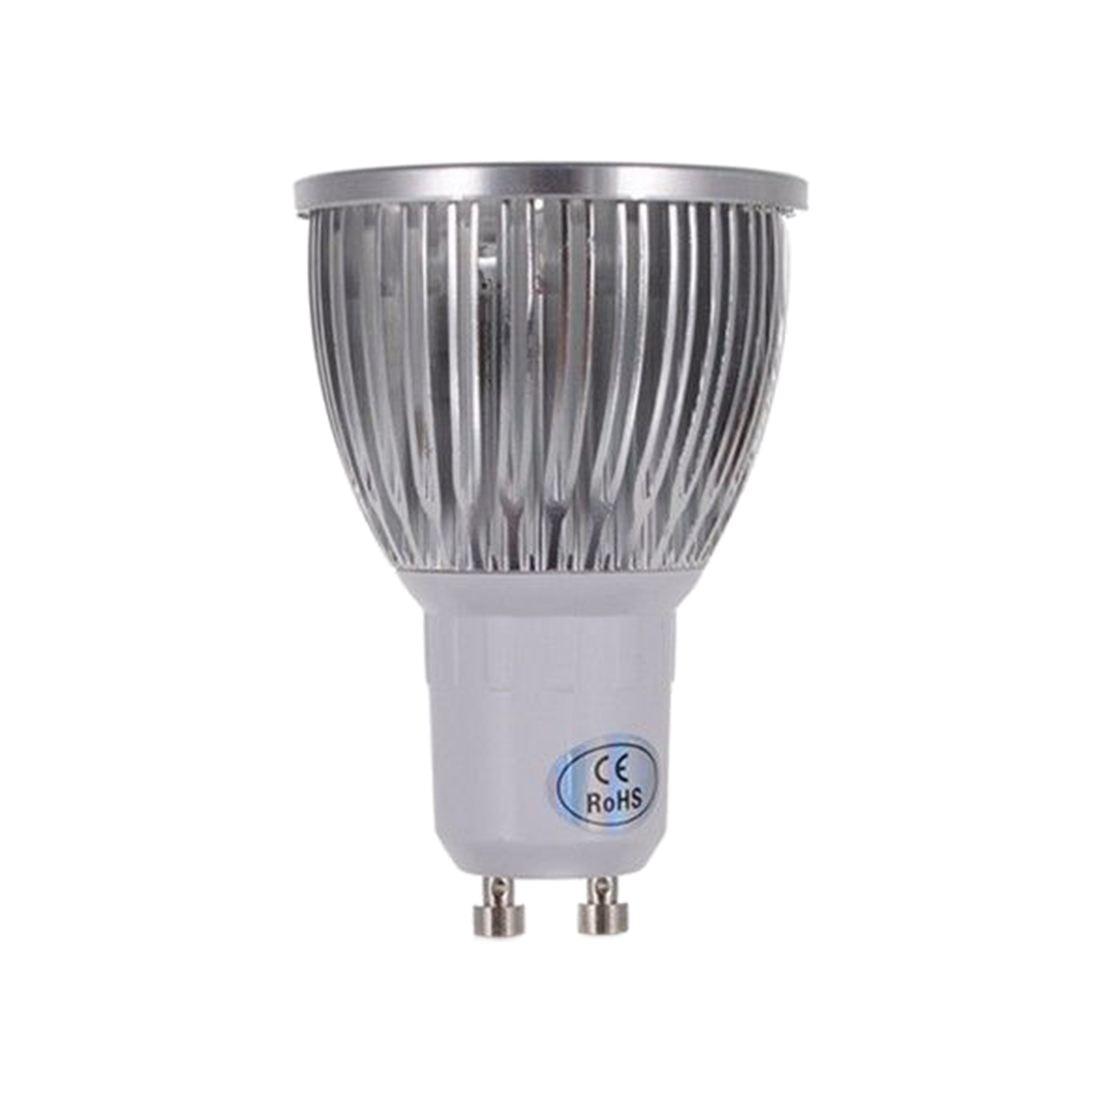 Pure / Warm LED Light Bulb - Warm White Base Power: GU10-8W-4LED- 220V - 4